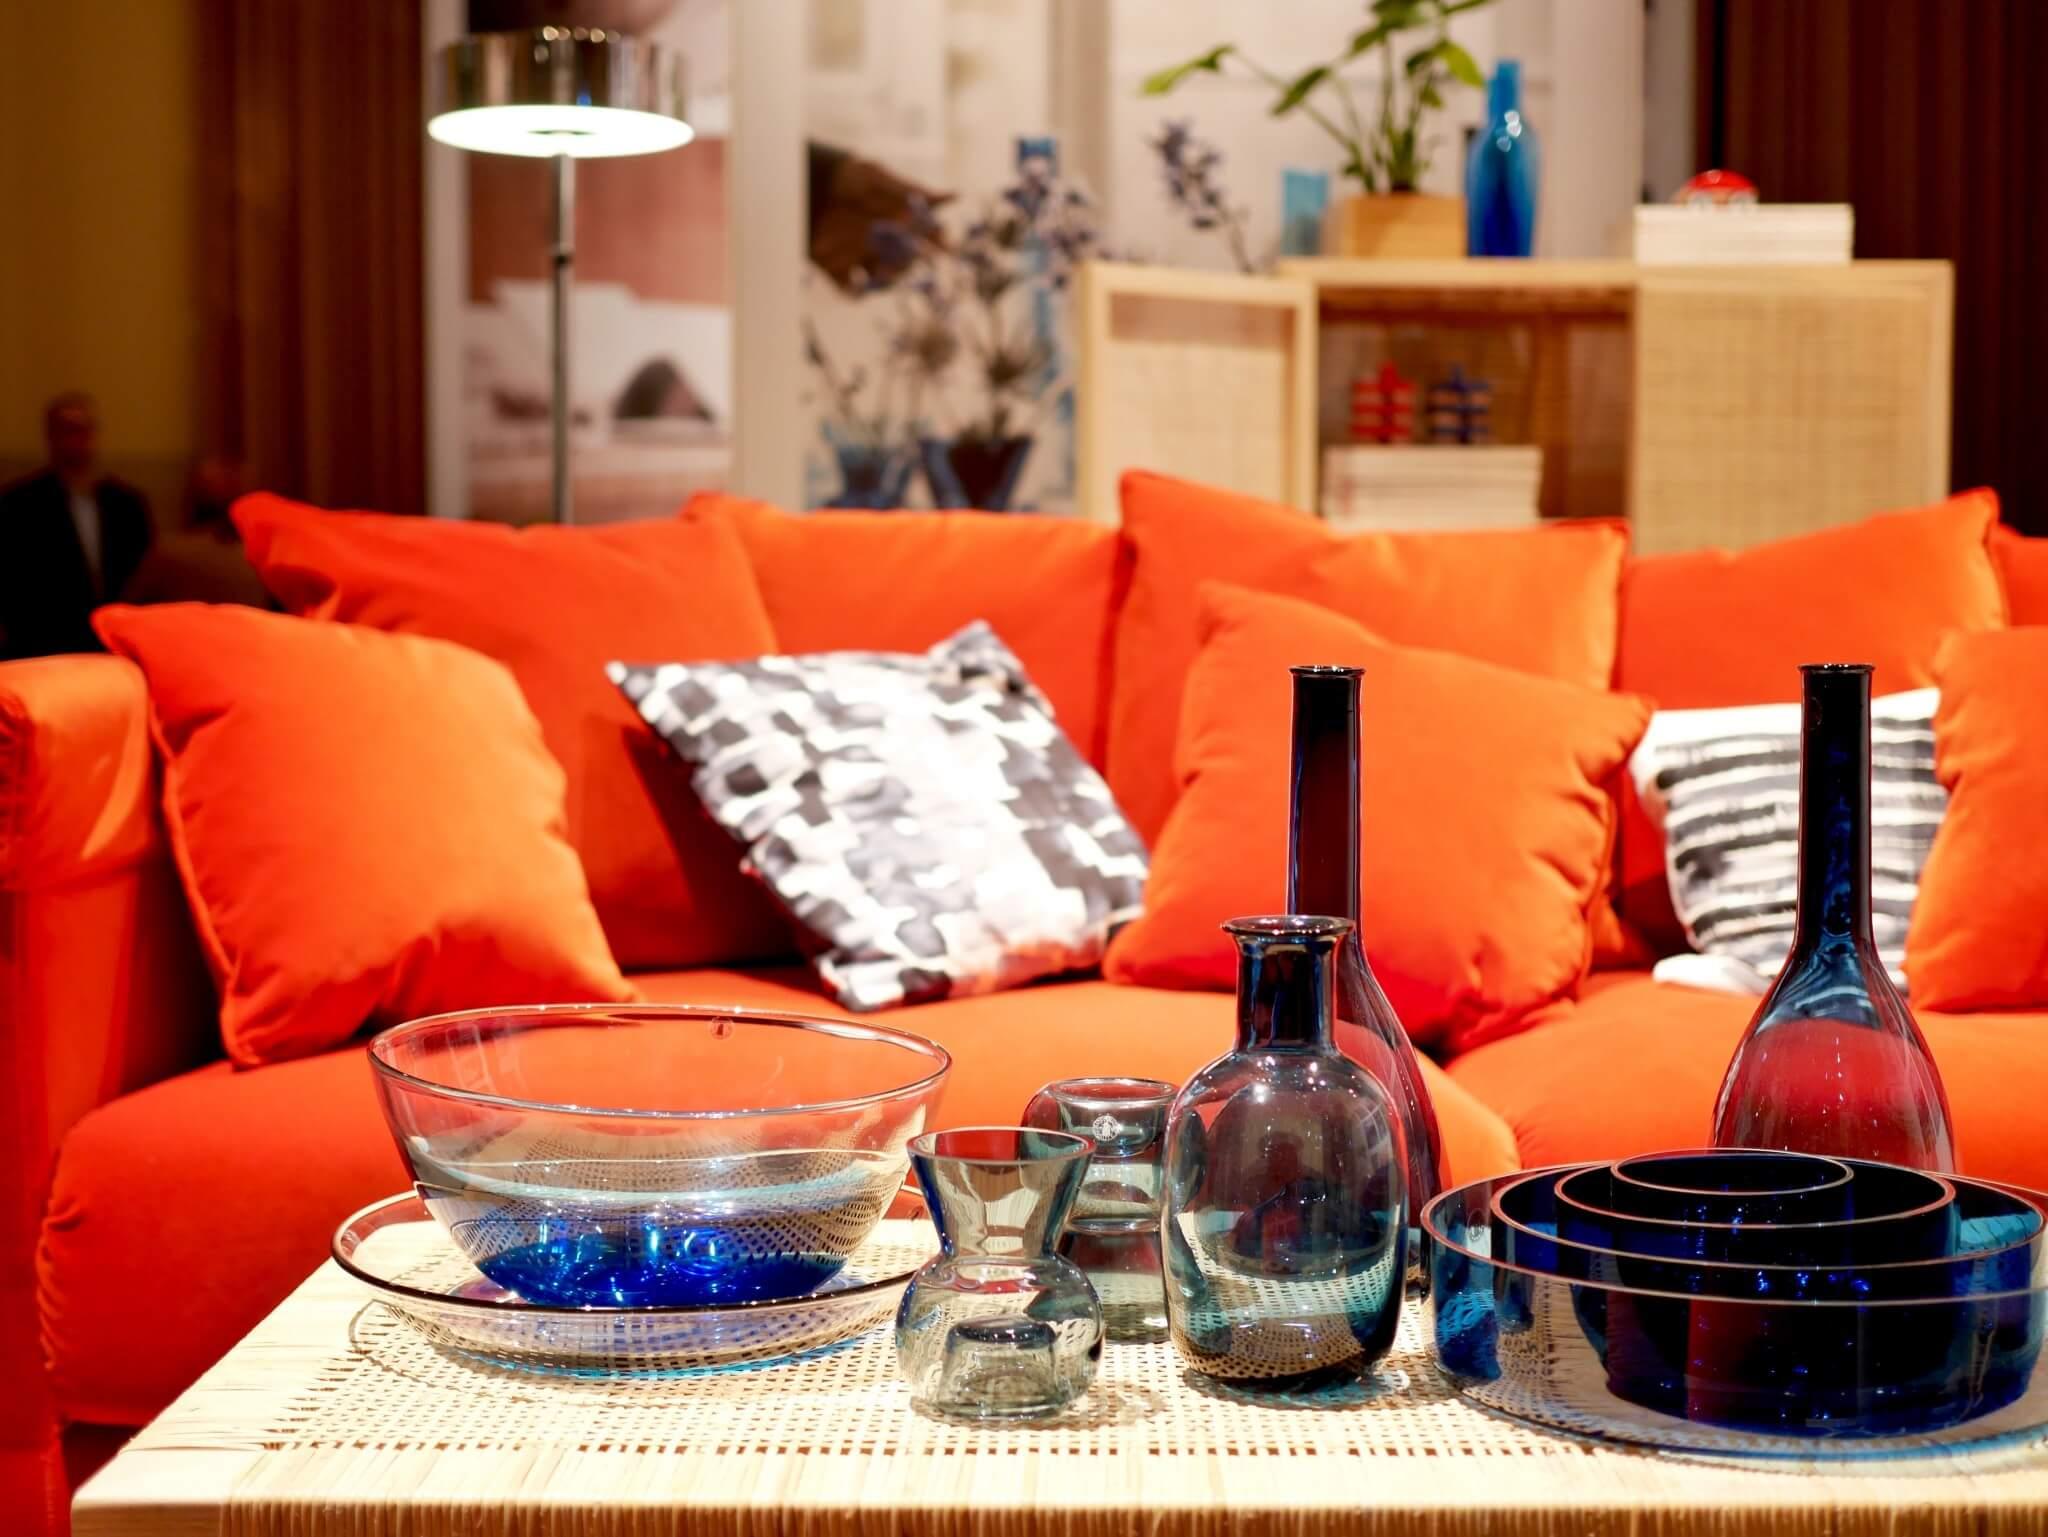 stockholm 2017 ikea visualisterna. Black Bedroom Furniture Sets. Home Design Ideas